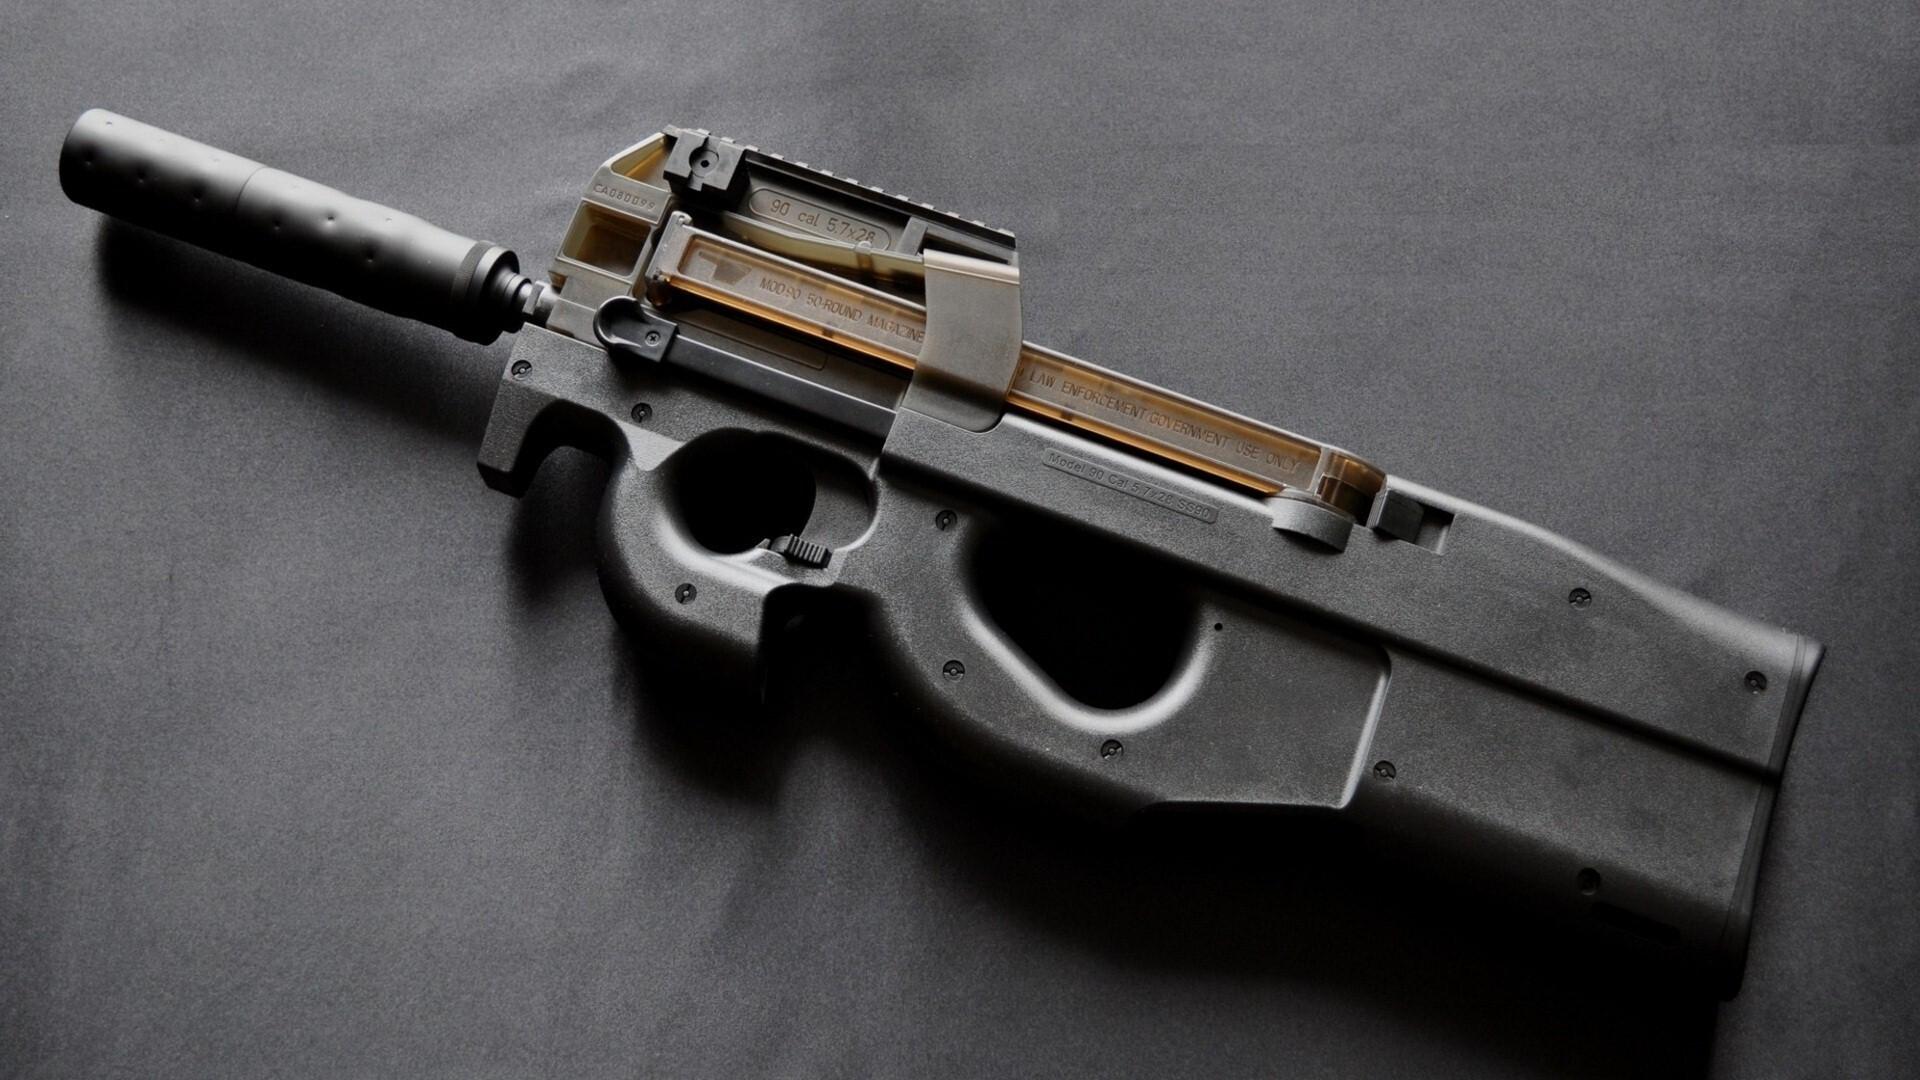 Hd wallpaper gun - 5652 Views 4366 Download Fn P90 Sub Machine Gun Hd Wallpaper